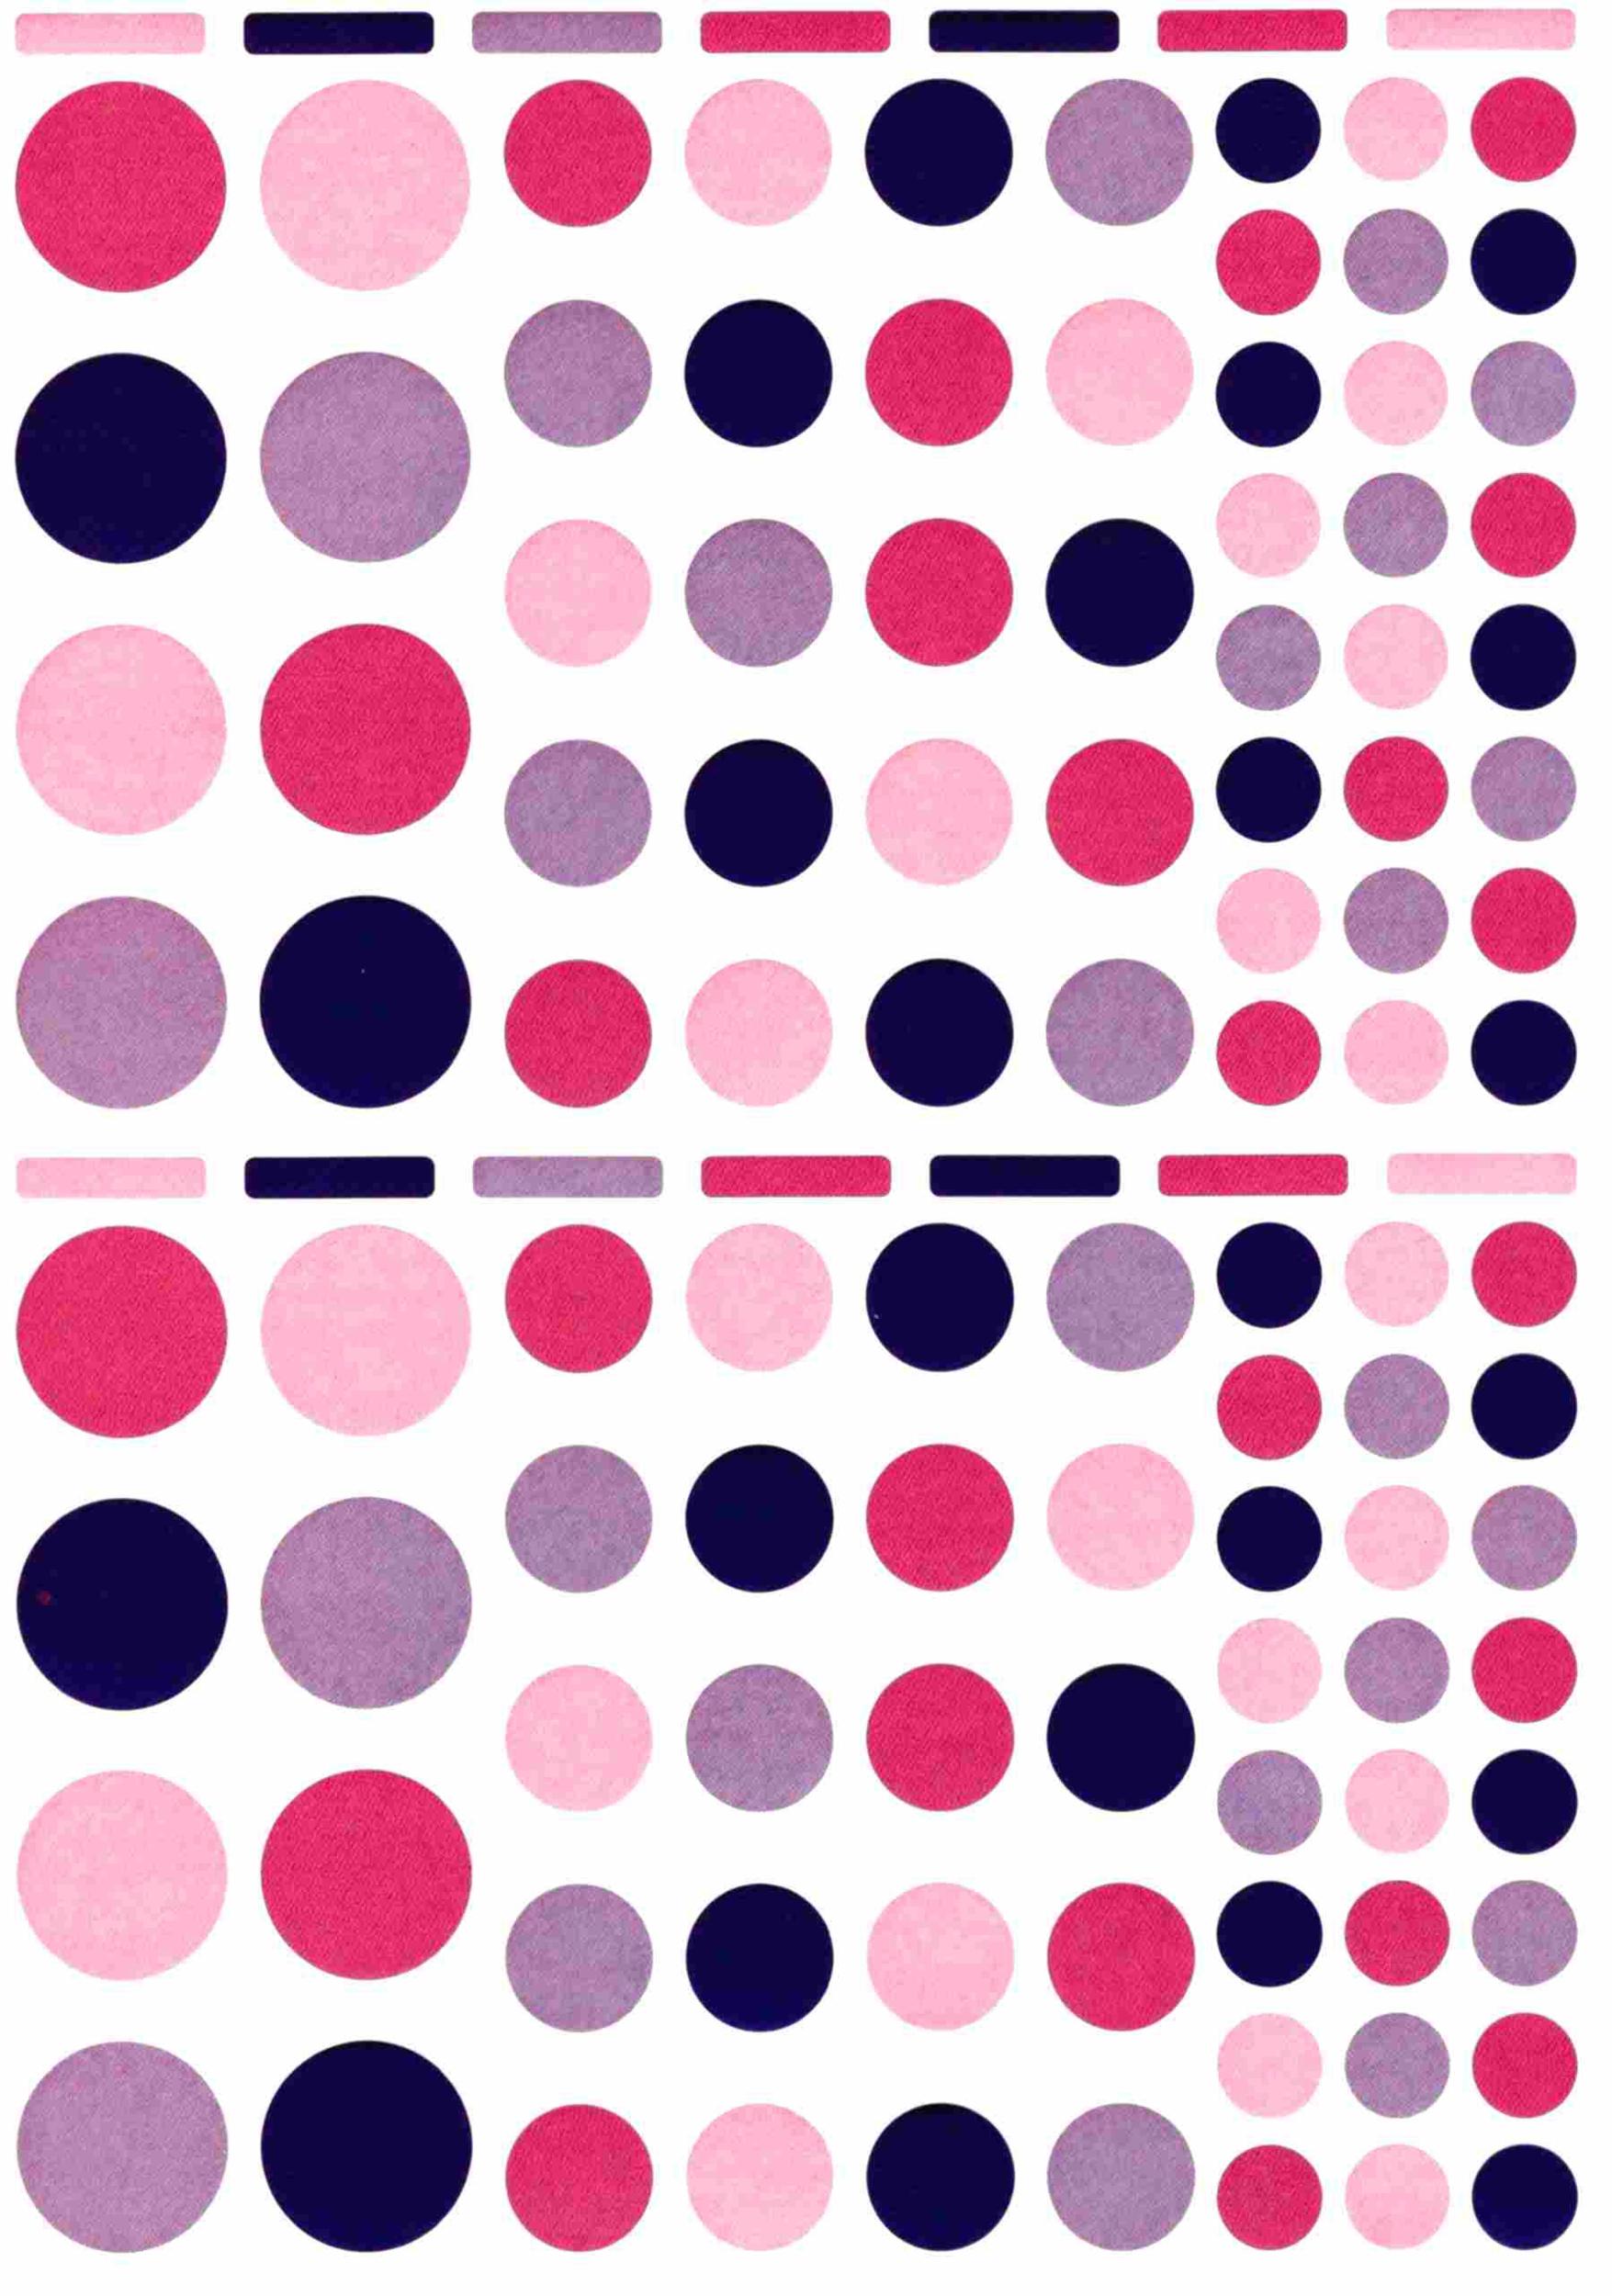 118 gommettes rondes multitailles Camaieu Pink Party